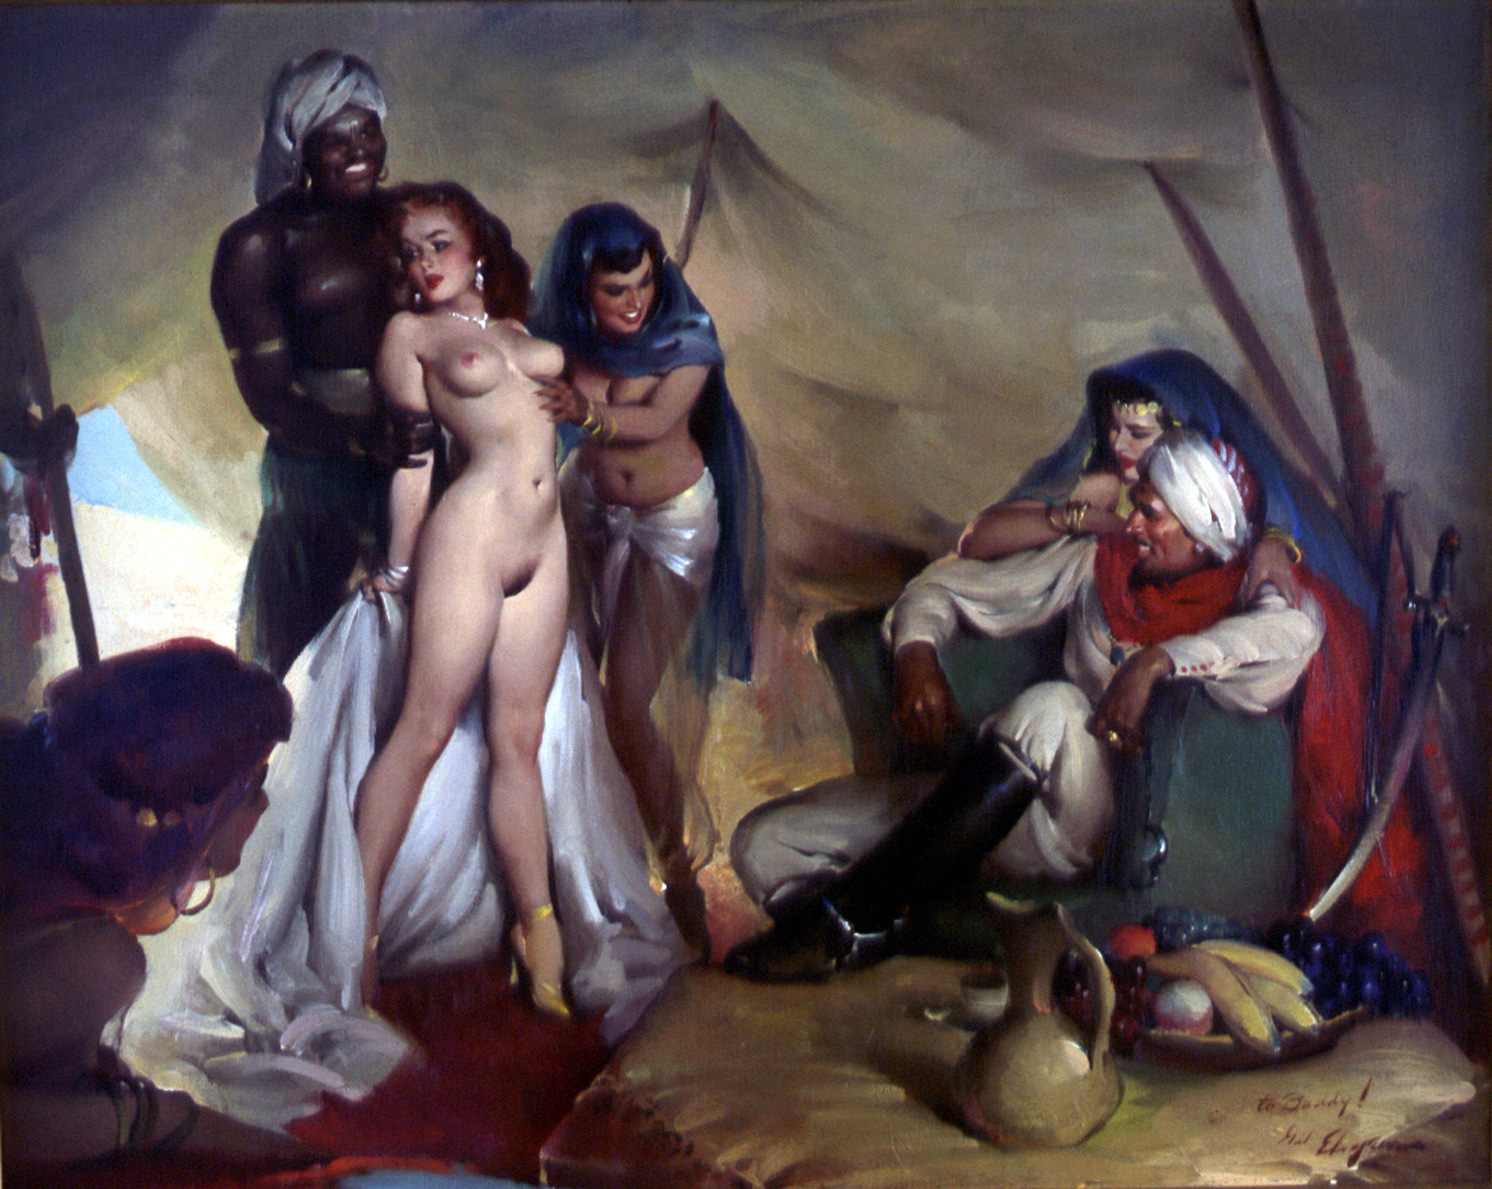 Древний рим секс с рабынями видео фото 186-732